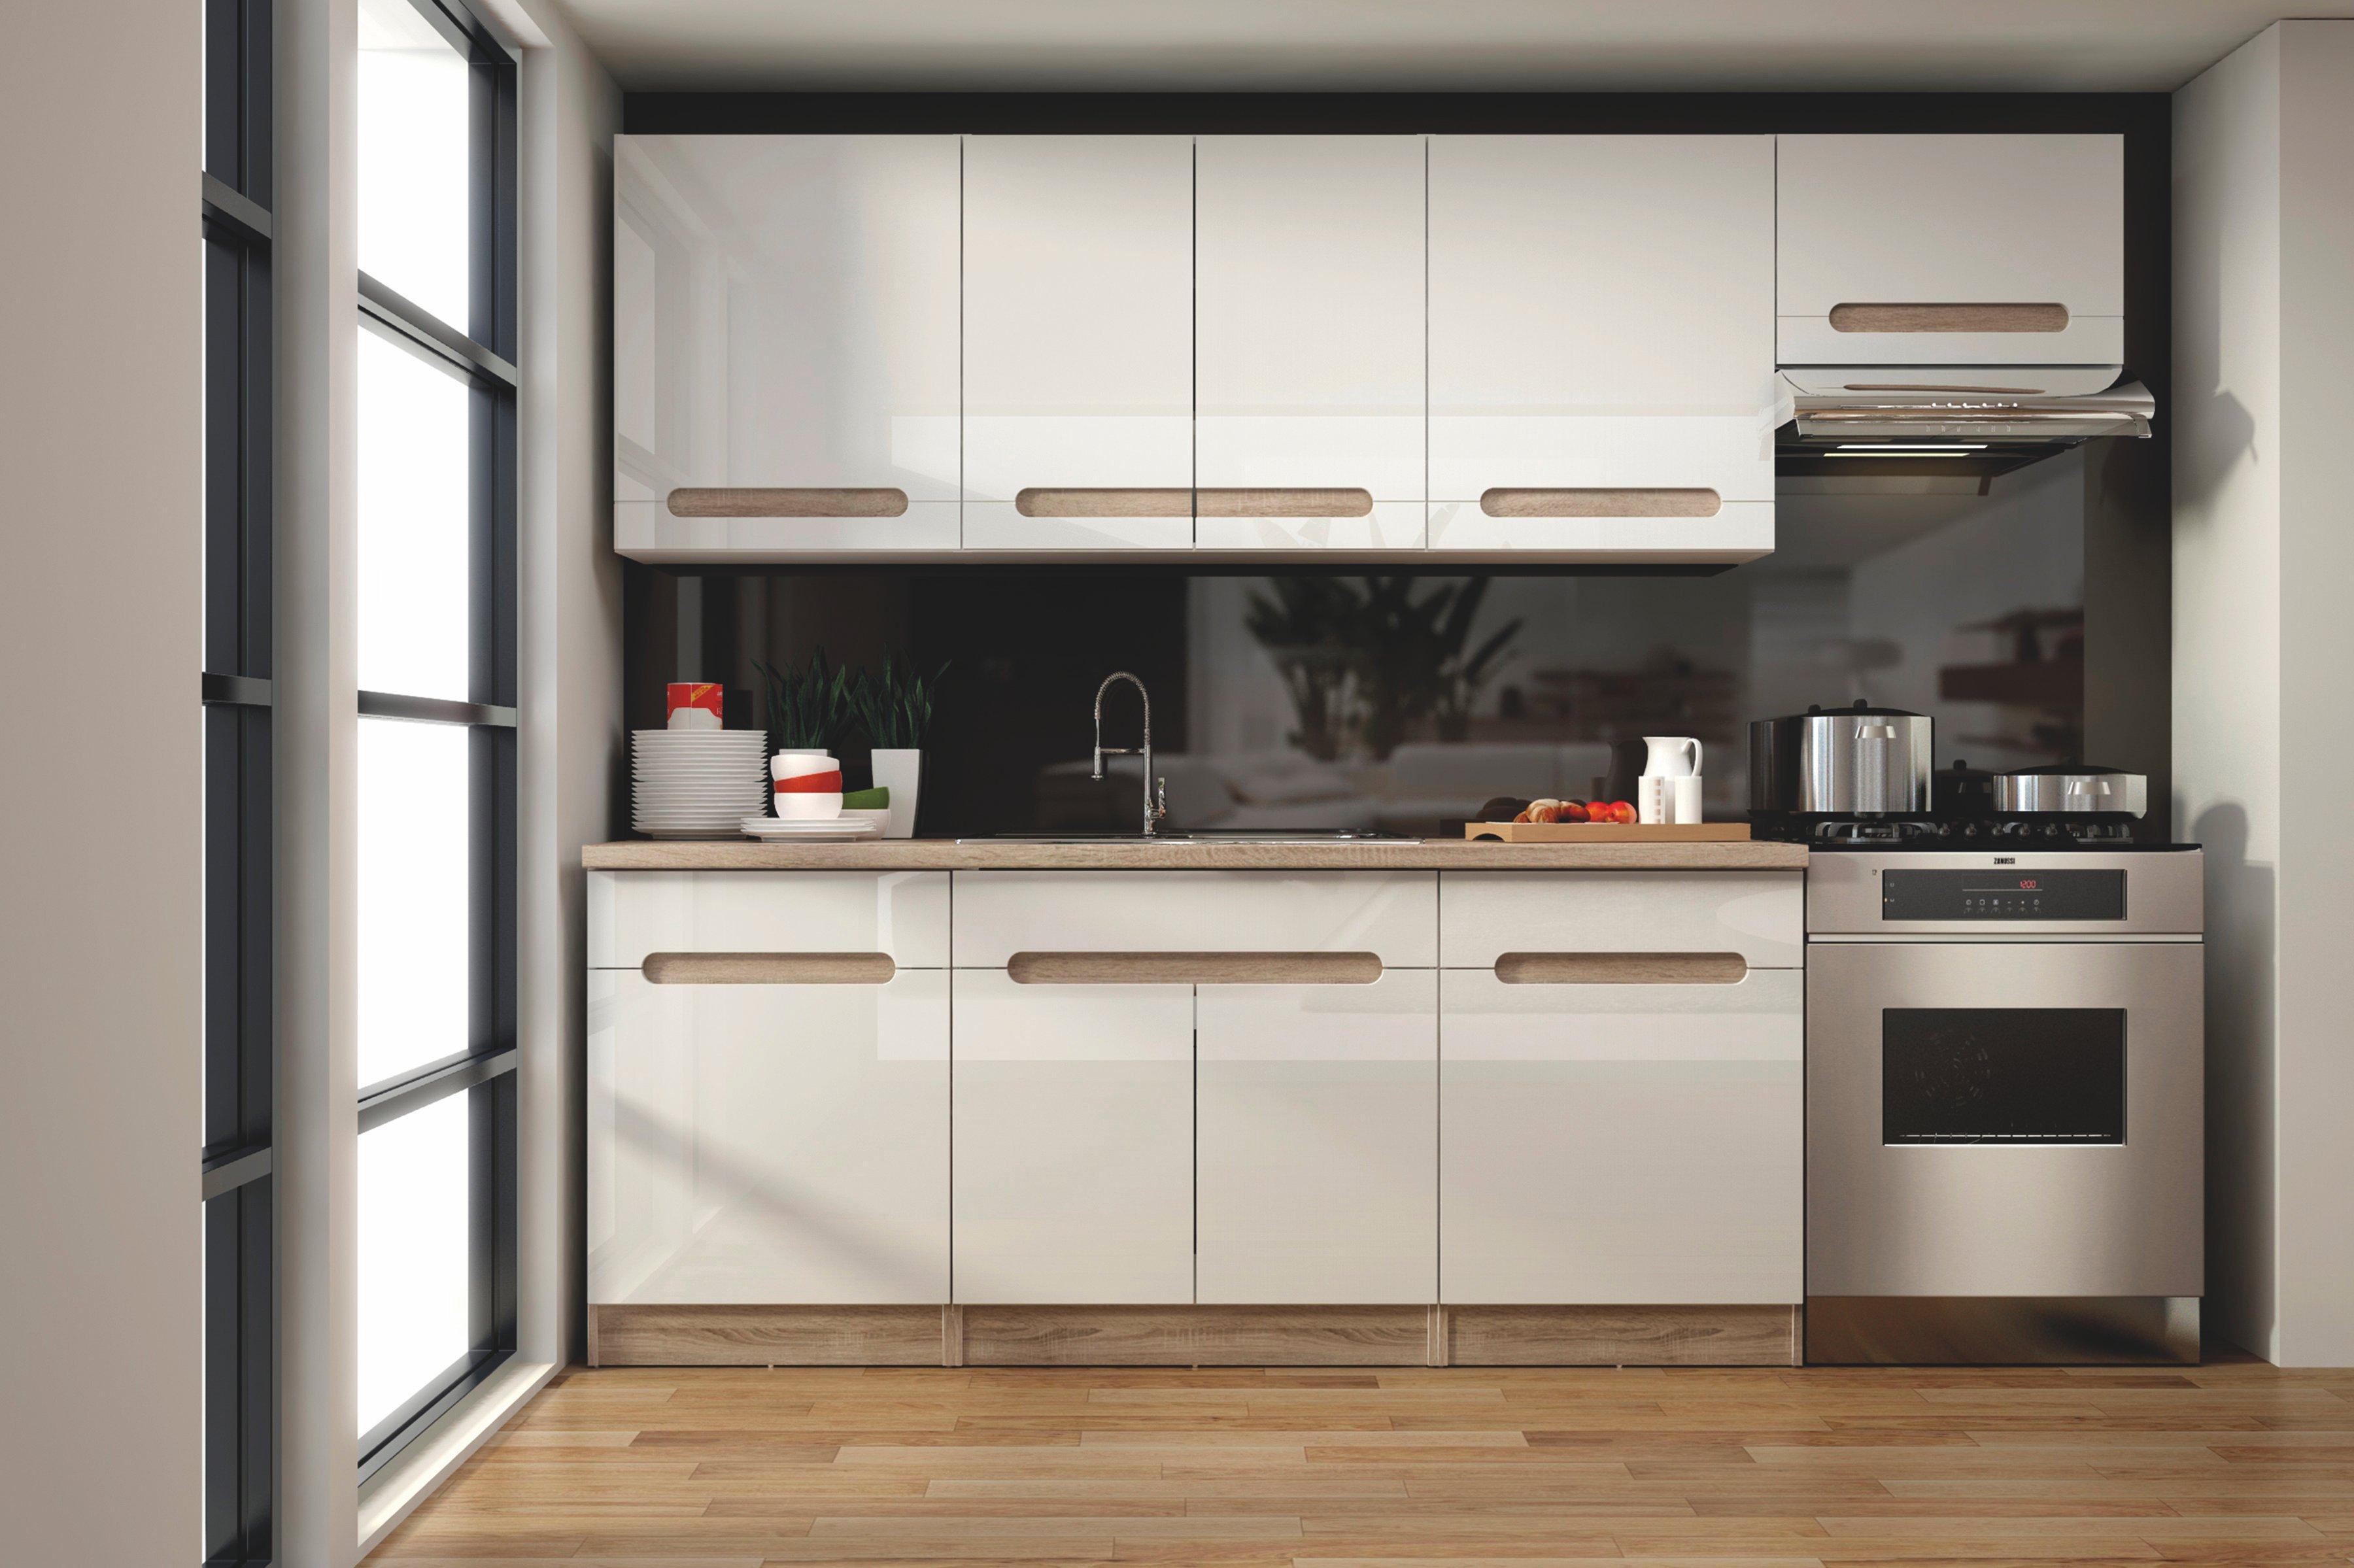 Kuchyně - Halmar - Sara 260 cm